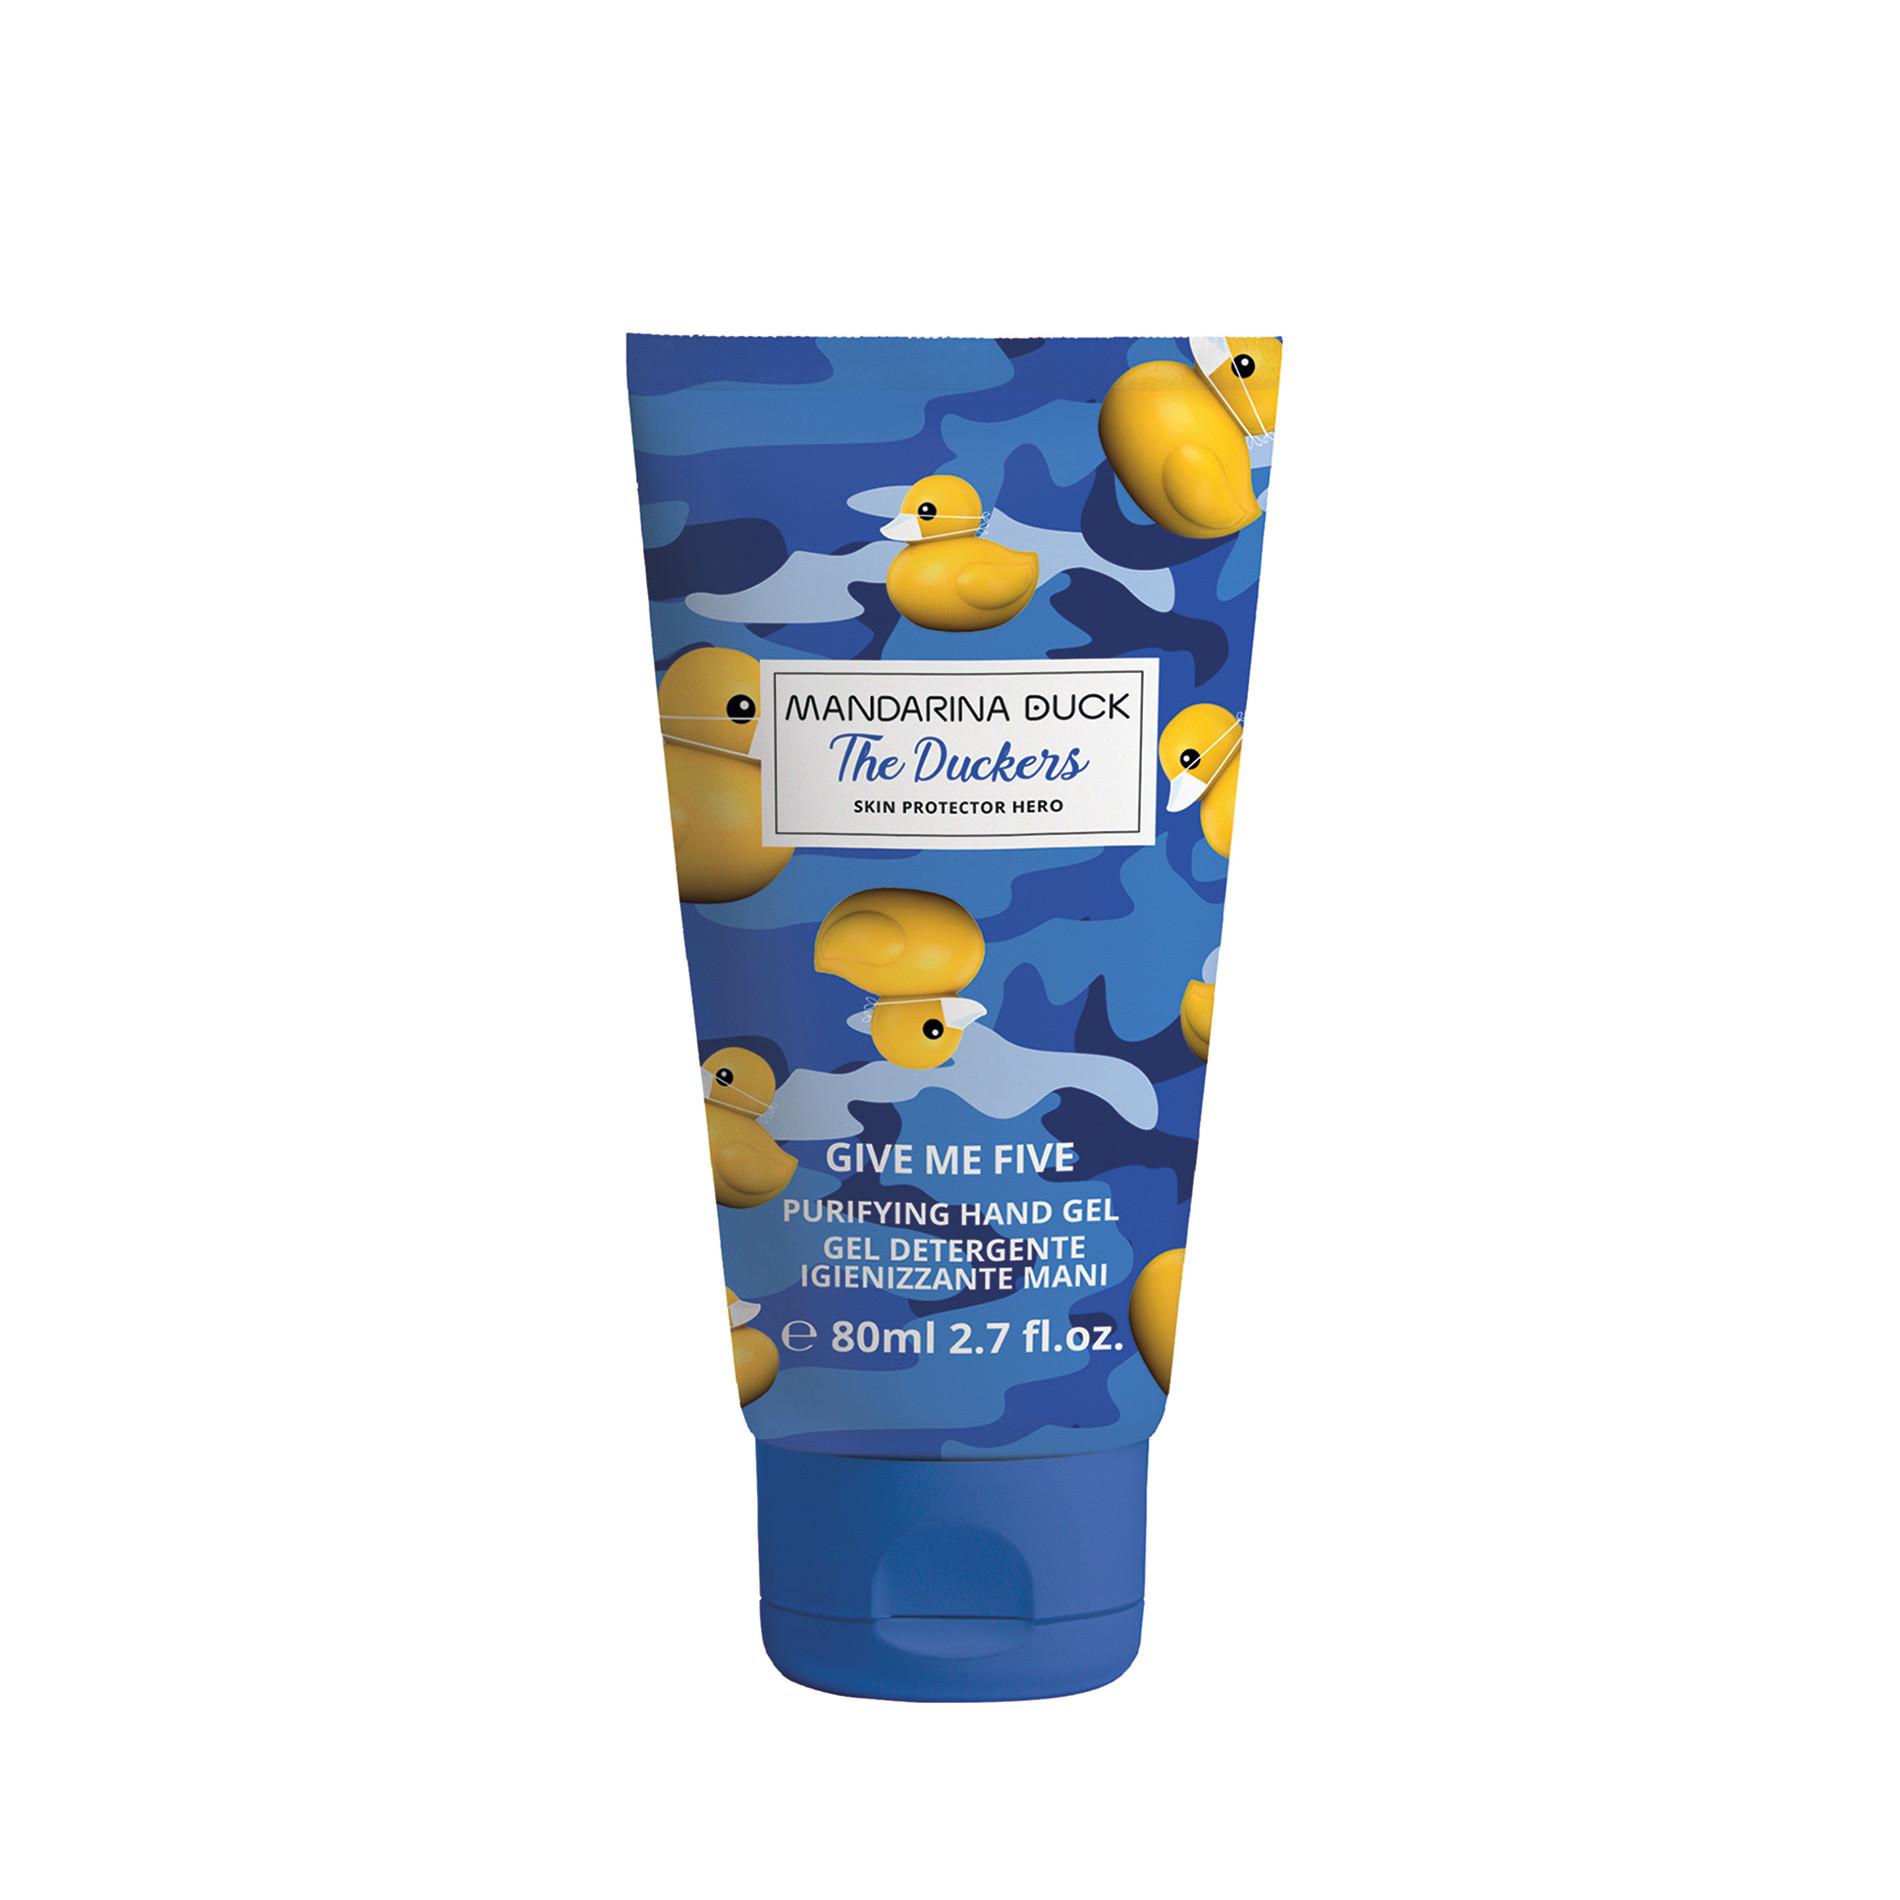 Gel cosmetico sanificante per mani Mandarina Duck 80ml, Multicolor, large image number 0